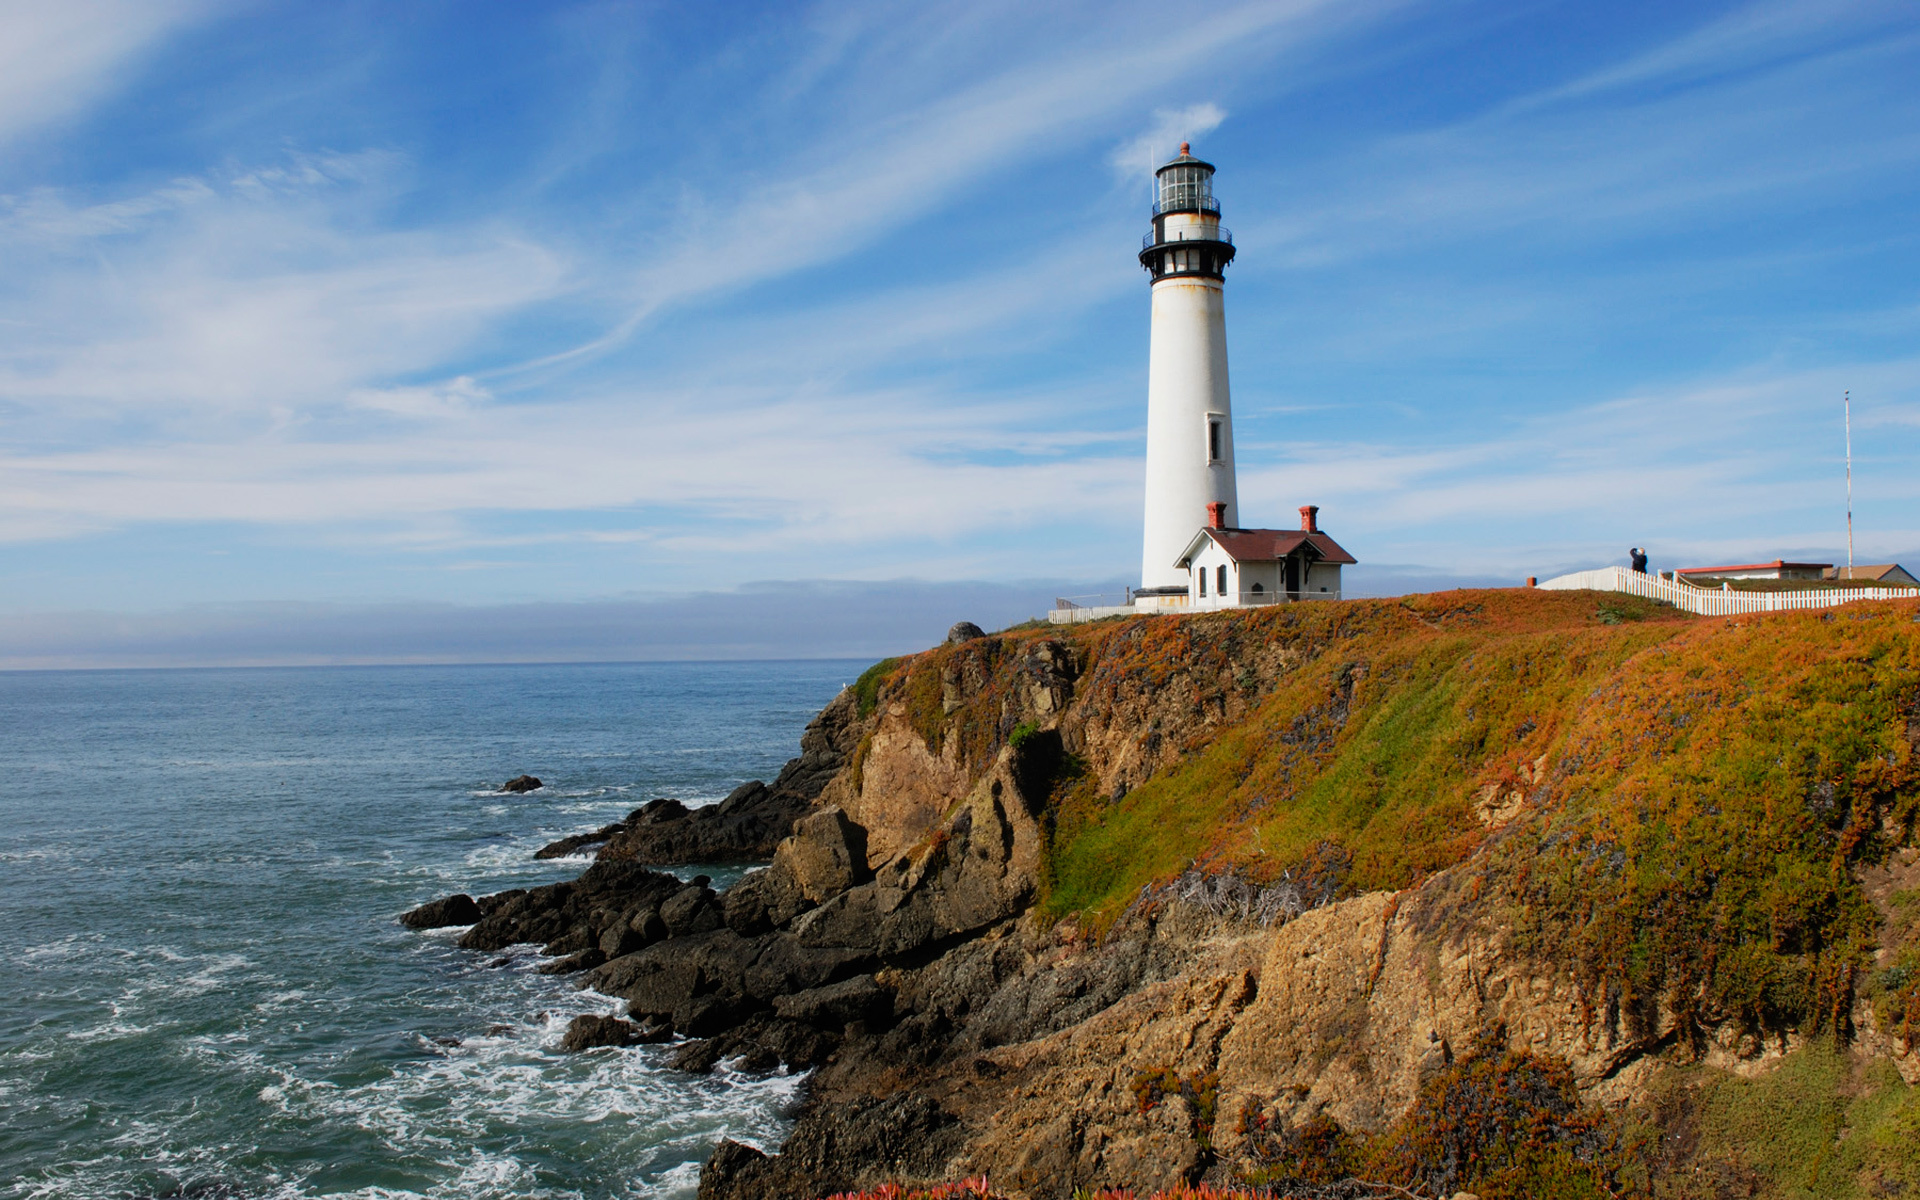 Download Wallpaper Macbook San Francisco - san-francisco-bay-area-lighthouse-wallpaper-1920x1200-435  2018_968077.jpg